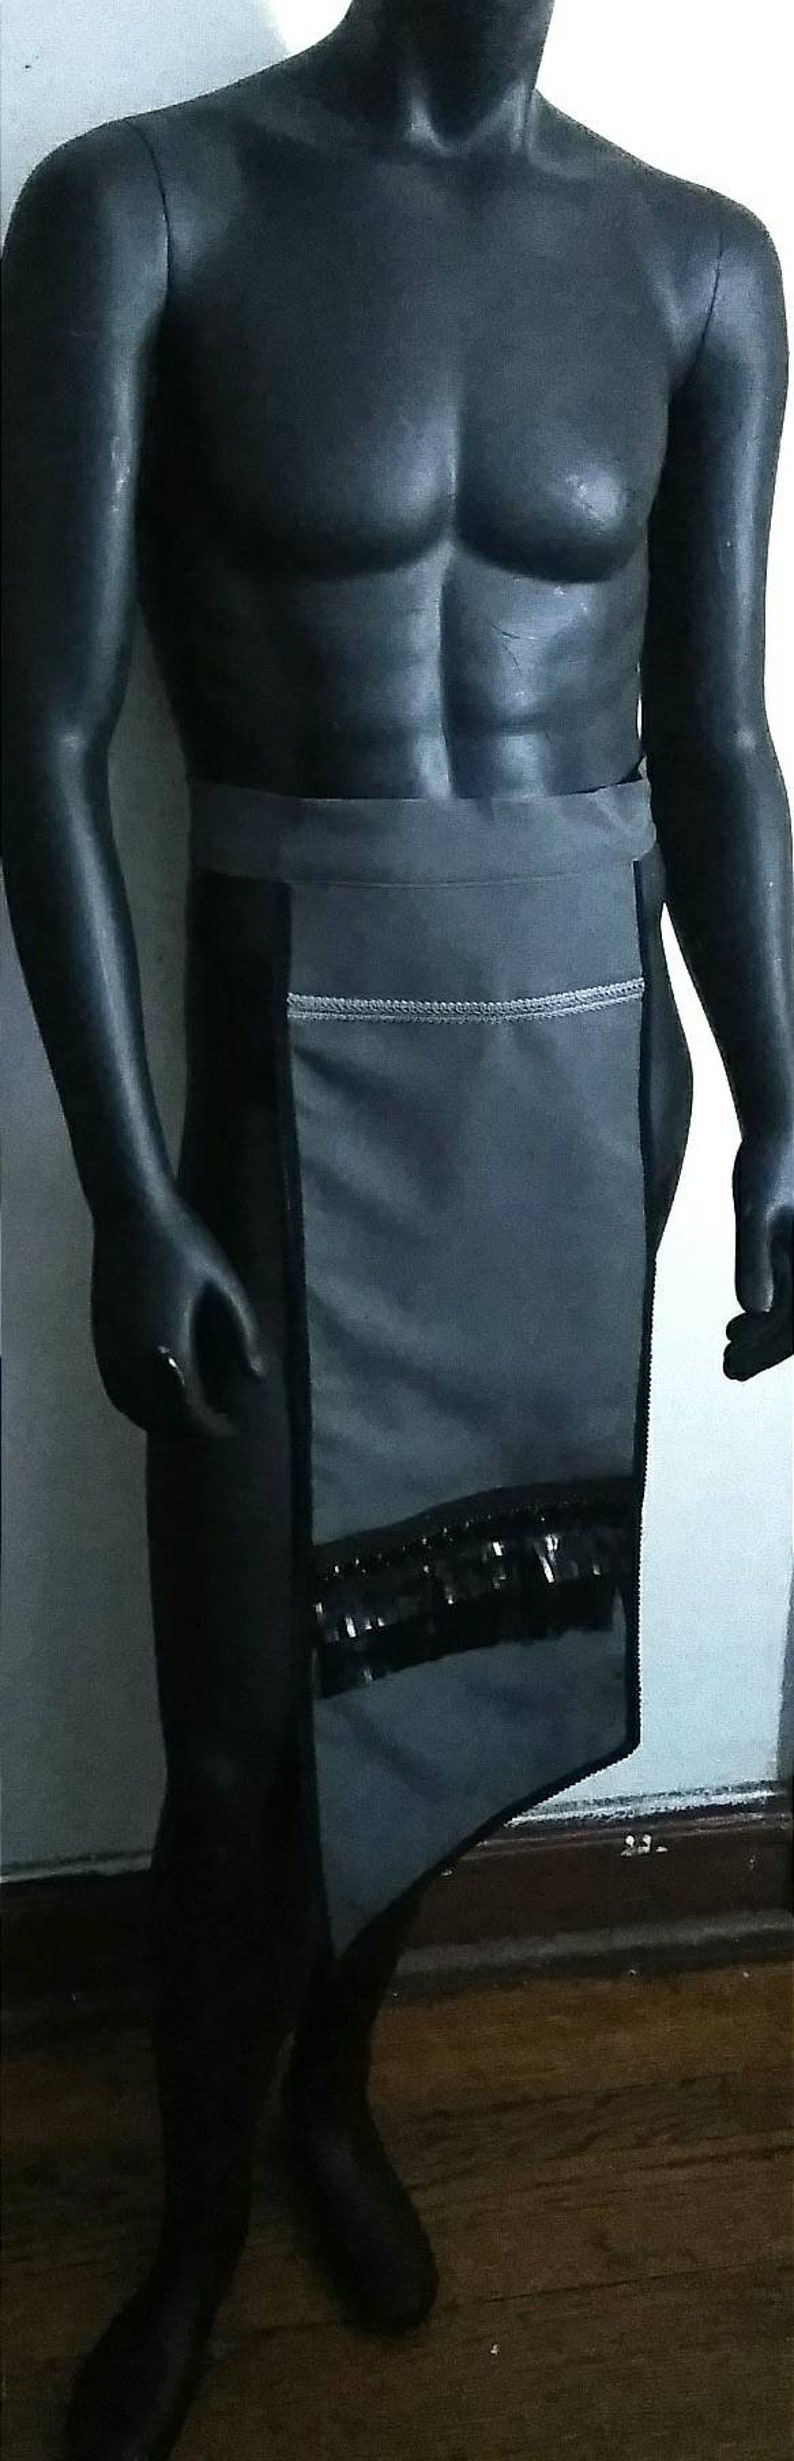 1 Panel STYLISHLY BARBARIC LOIN Cloth Accessory